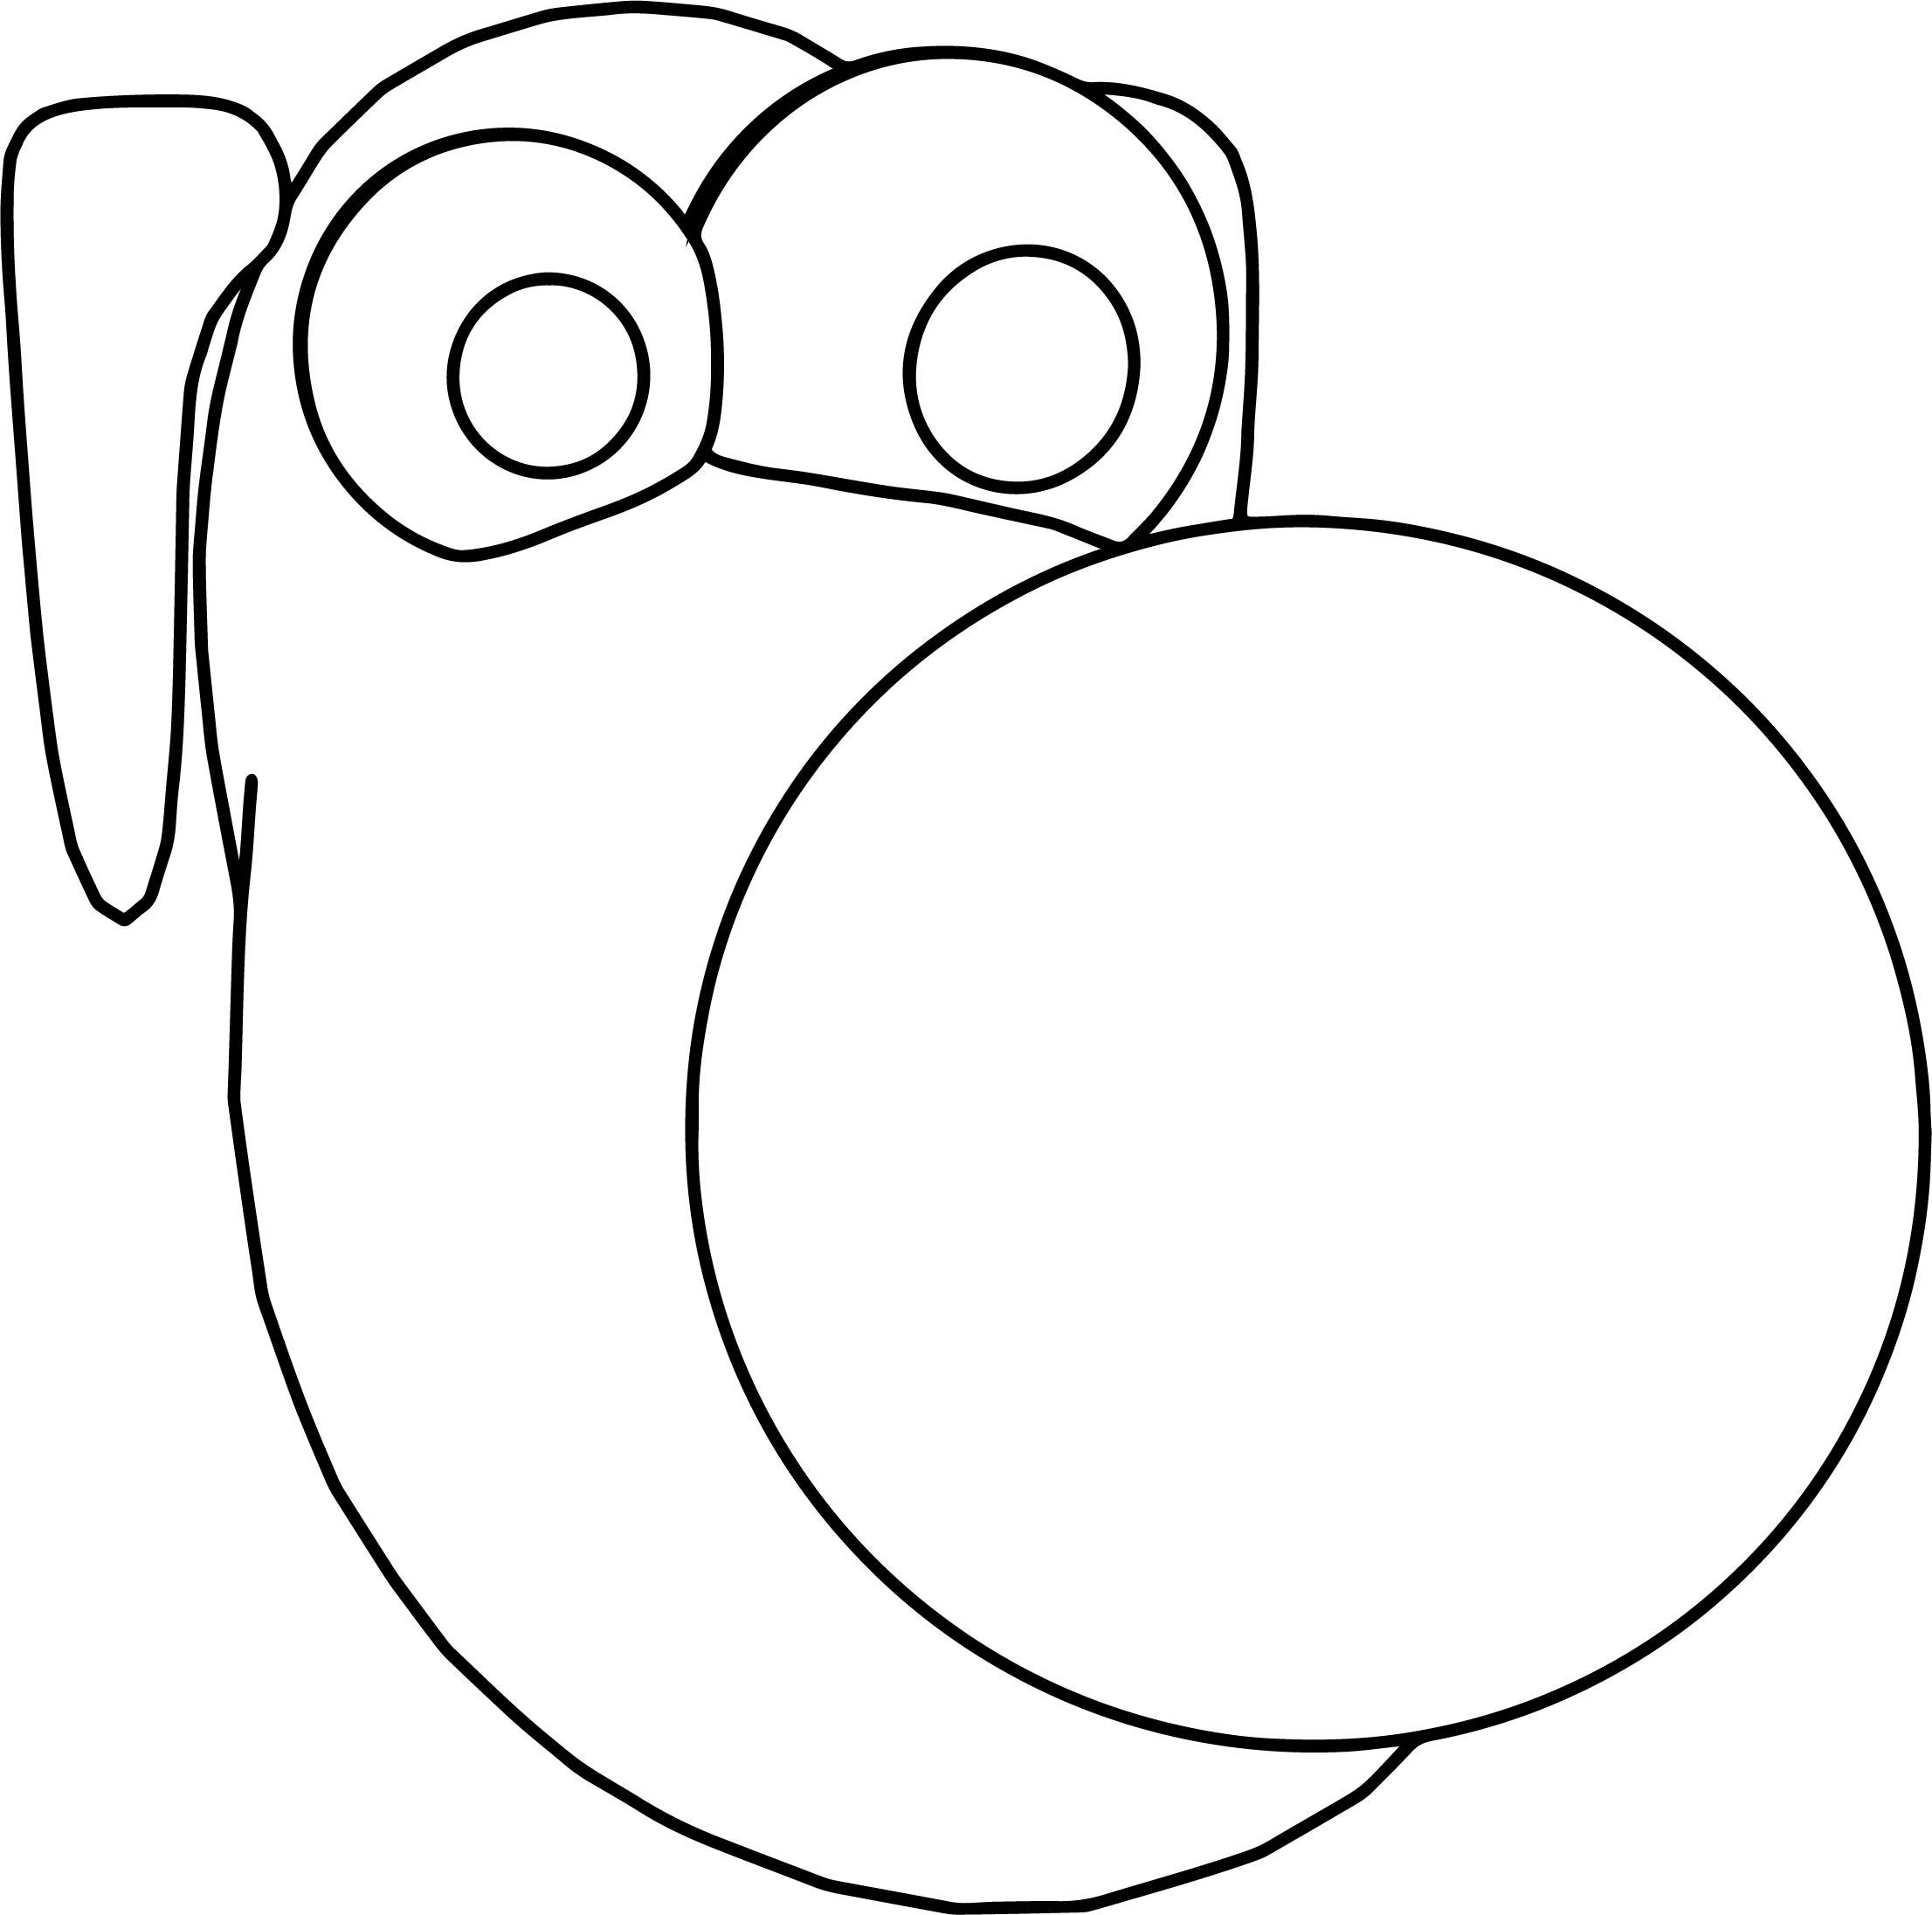 dog face coloring pages - dog face coloring pages